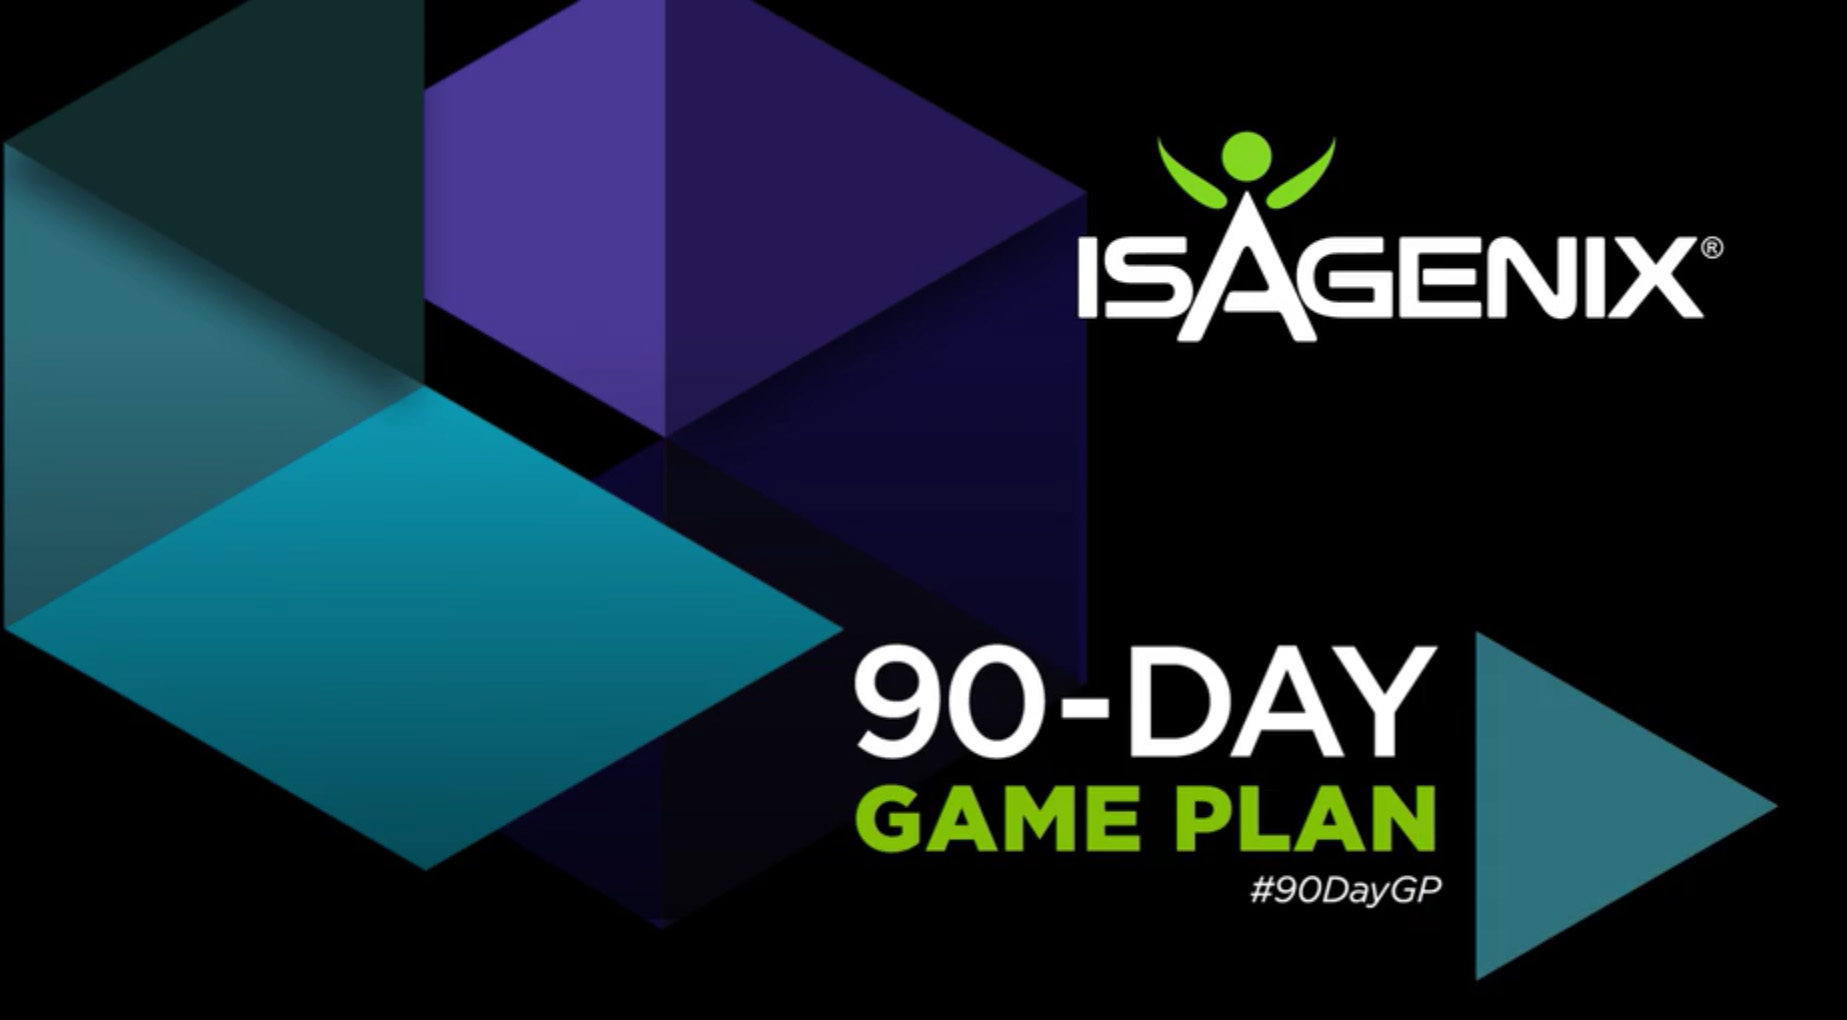 Isagenix Business: Launch - US